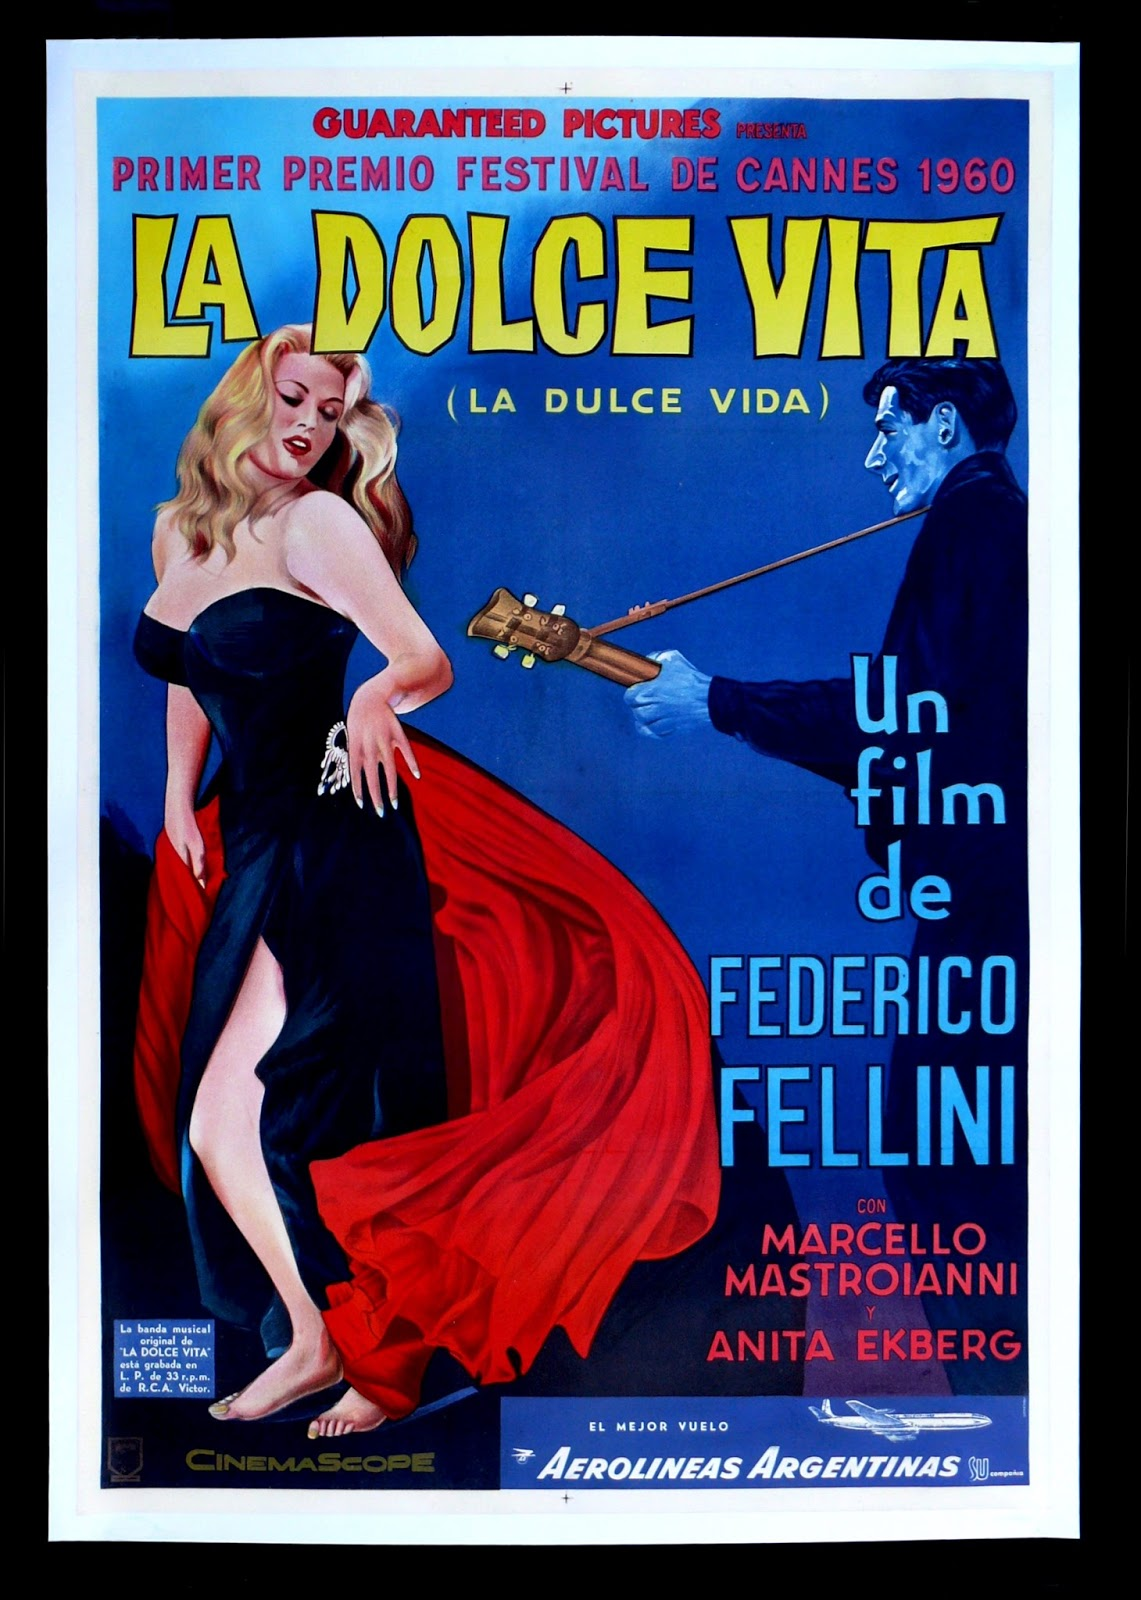 5d8bb6d059fa5 La Dolce Vita is a 1960 Italian drama film directed and co-written by  Federico Fellini. The film follows Marcello Rubini, a journalist writing  for gossip ...